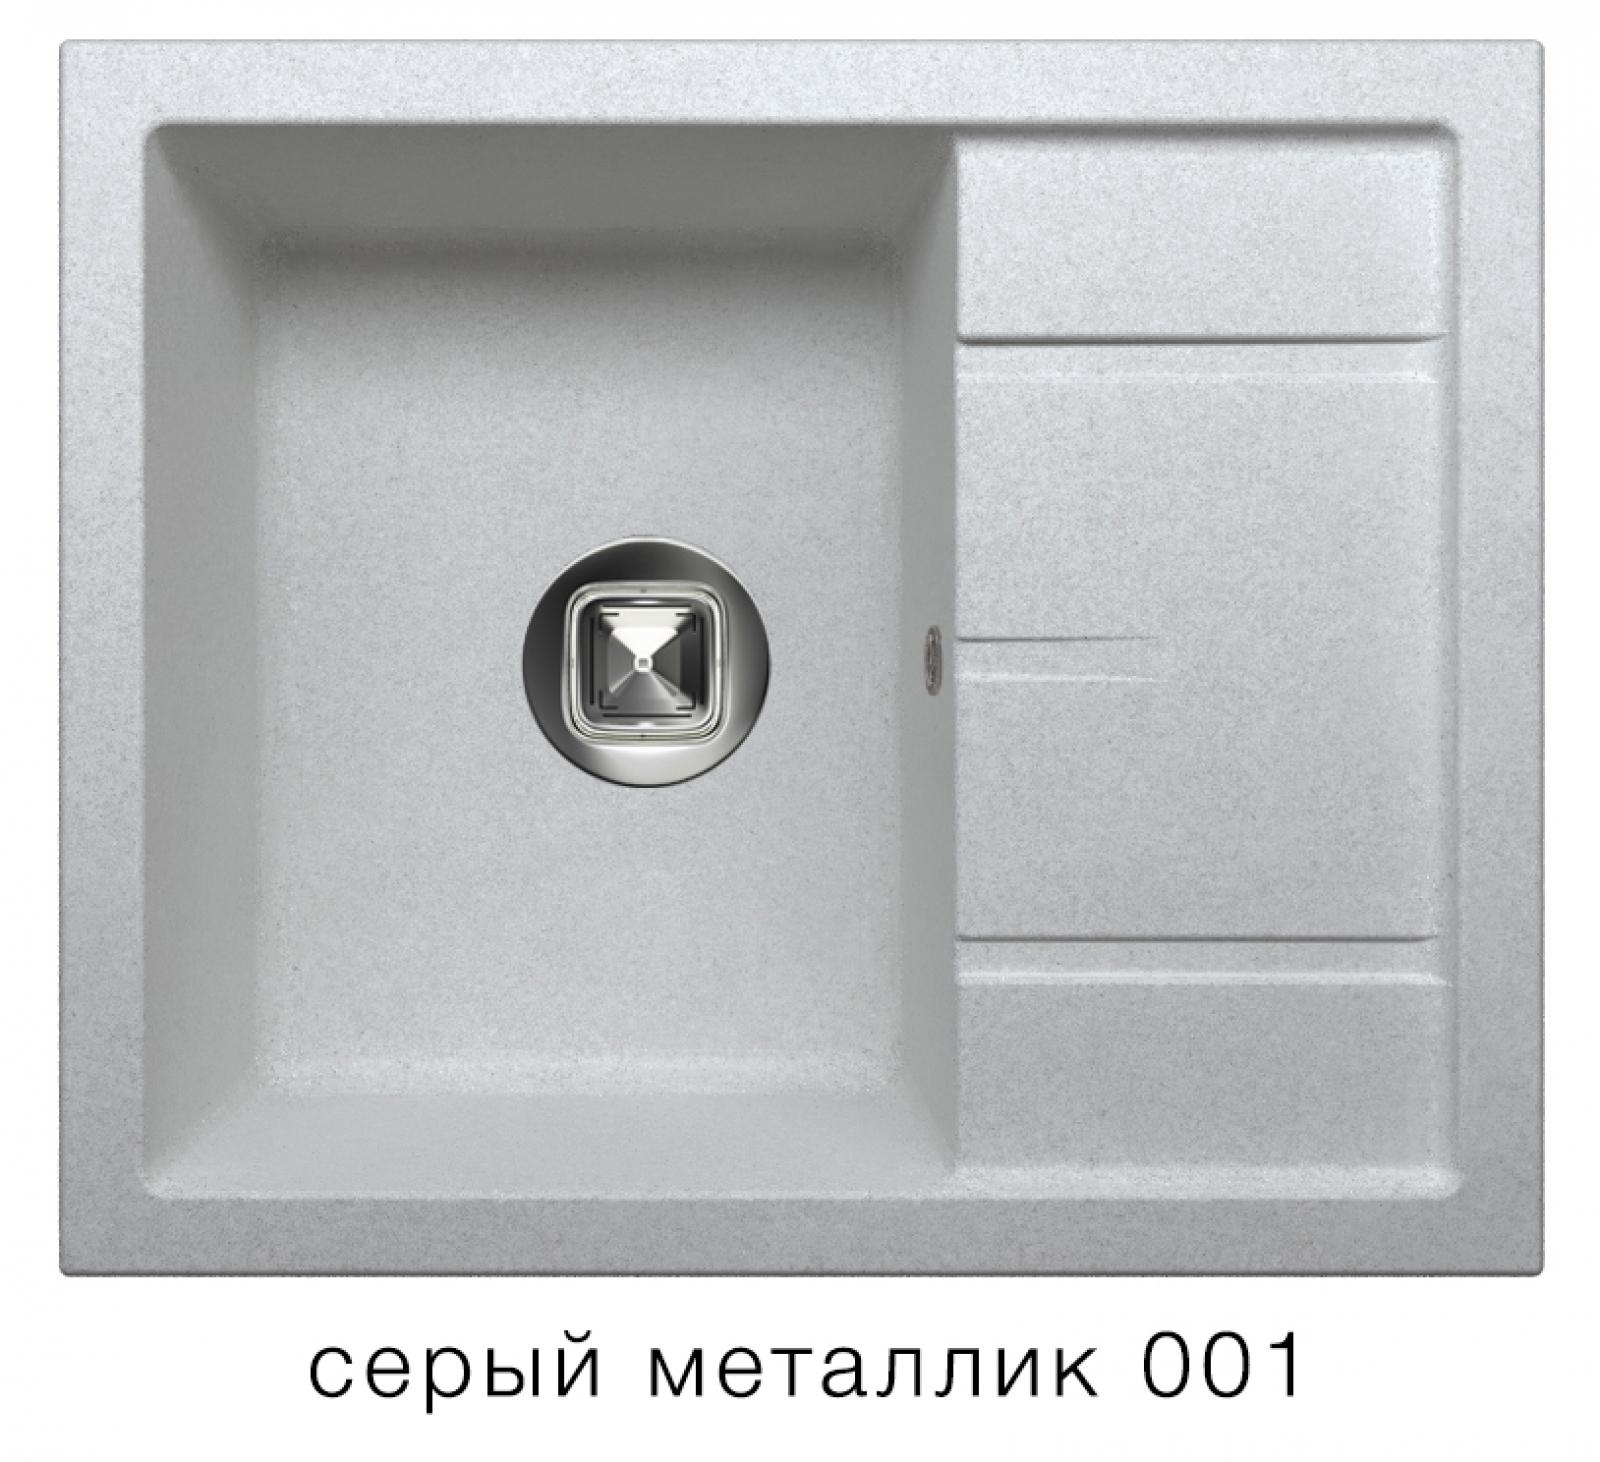 Мойка Tolero-R-107-001, цвет - Серый металл